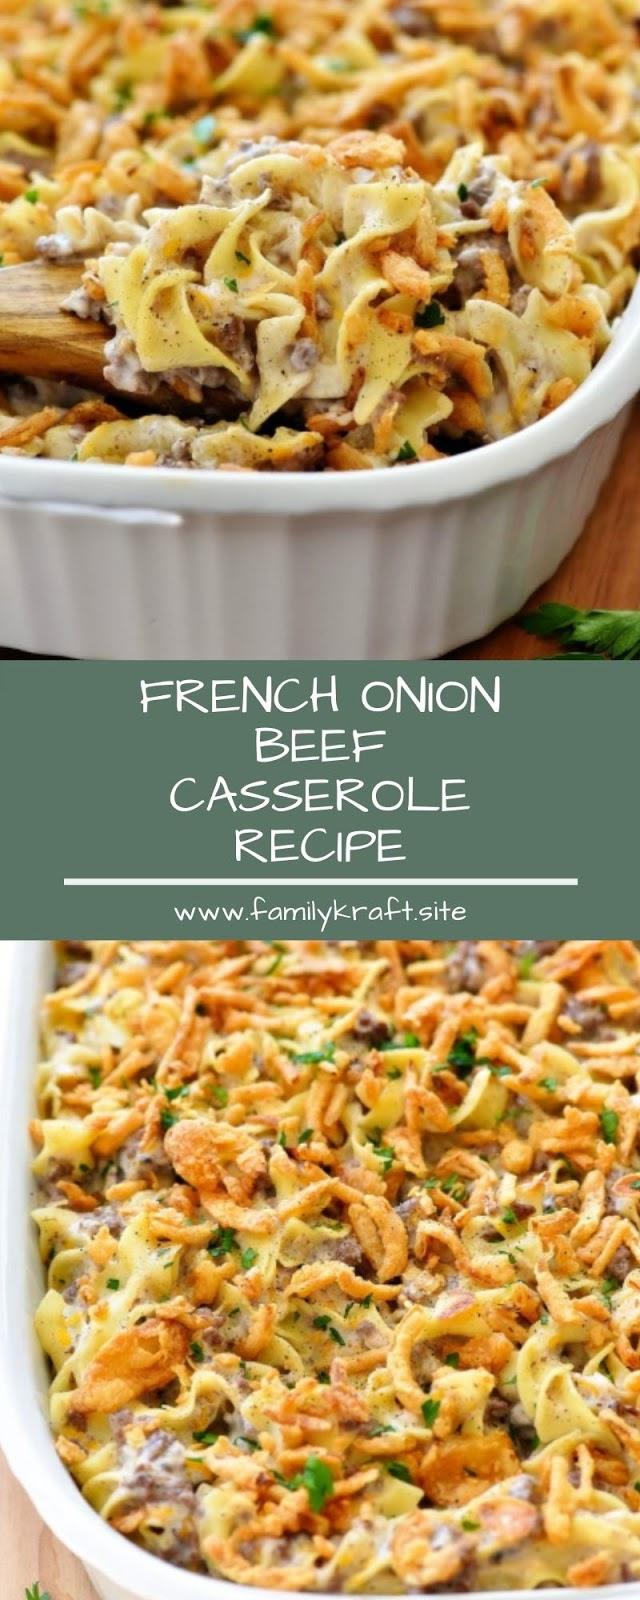 FRENCH ONION BEEF CASSEROLE RECIPE